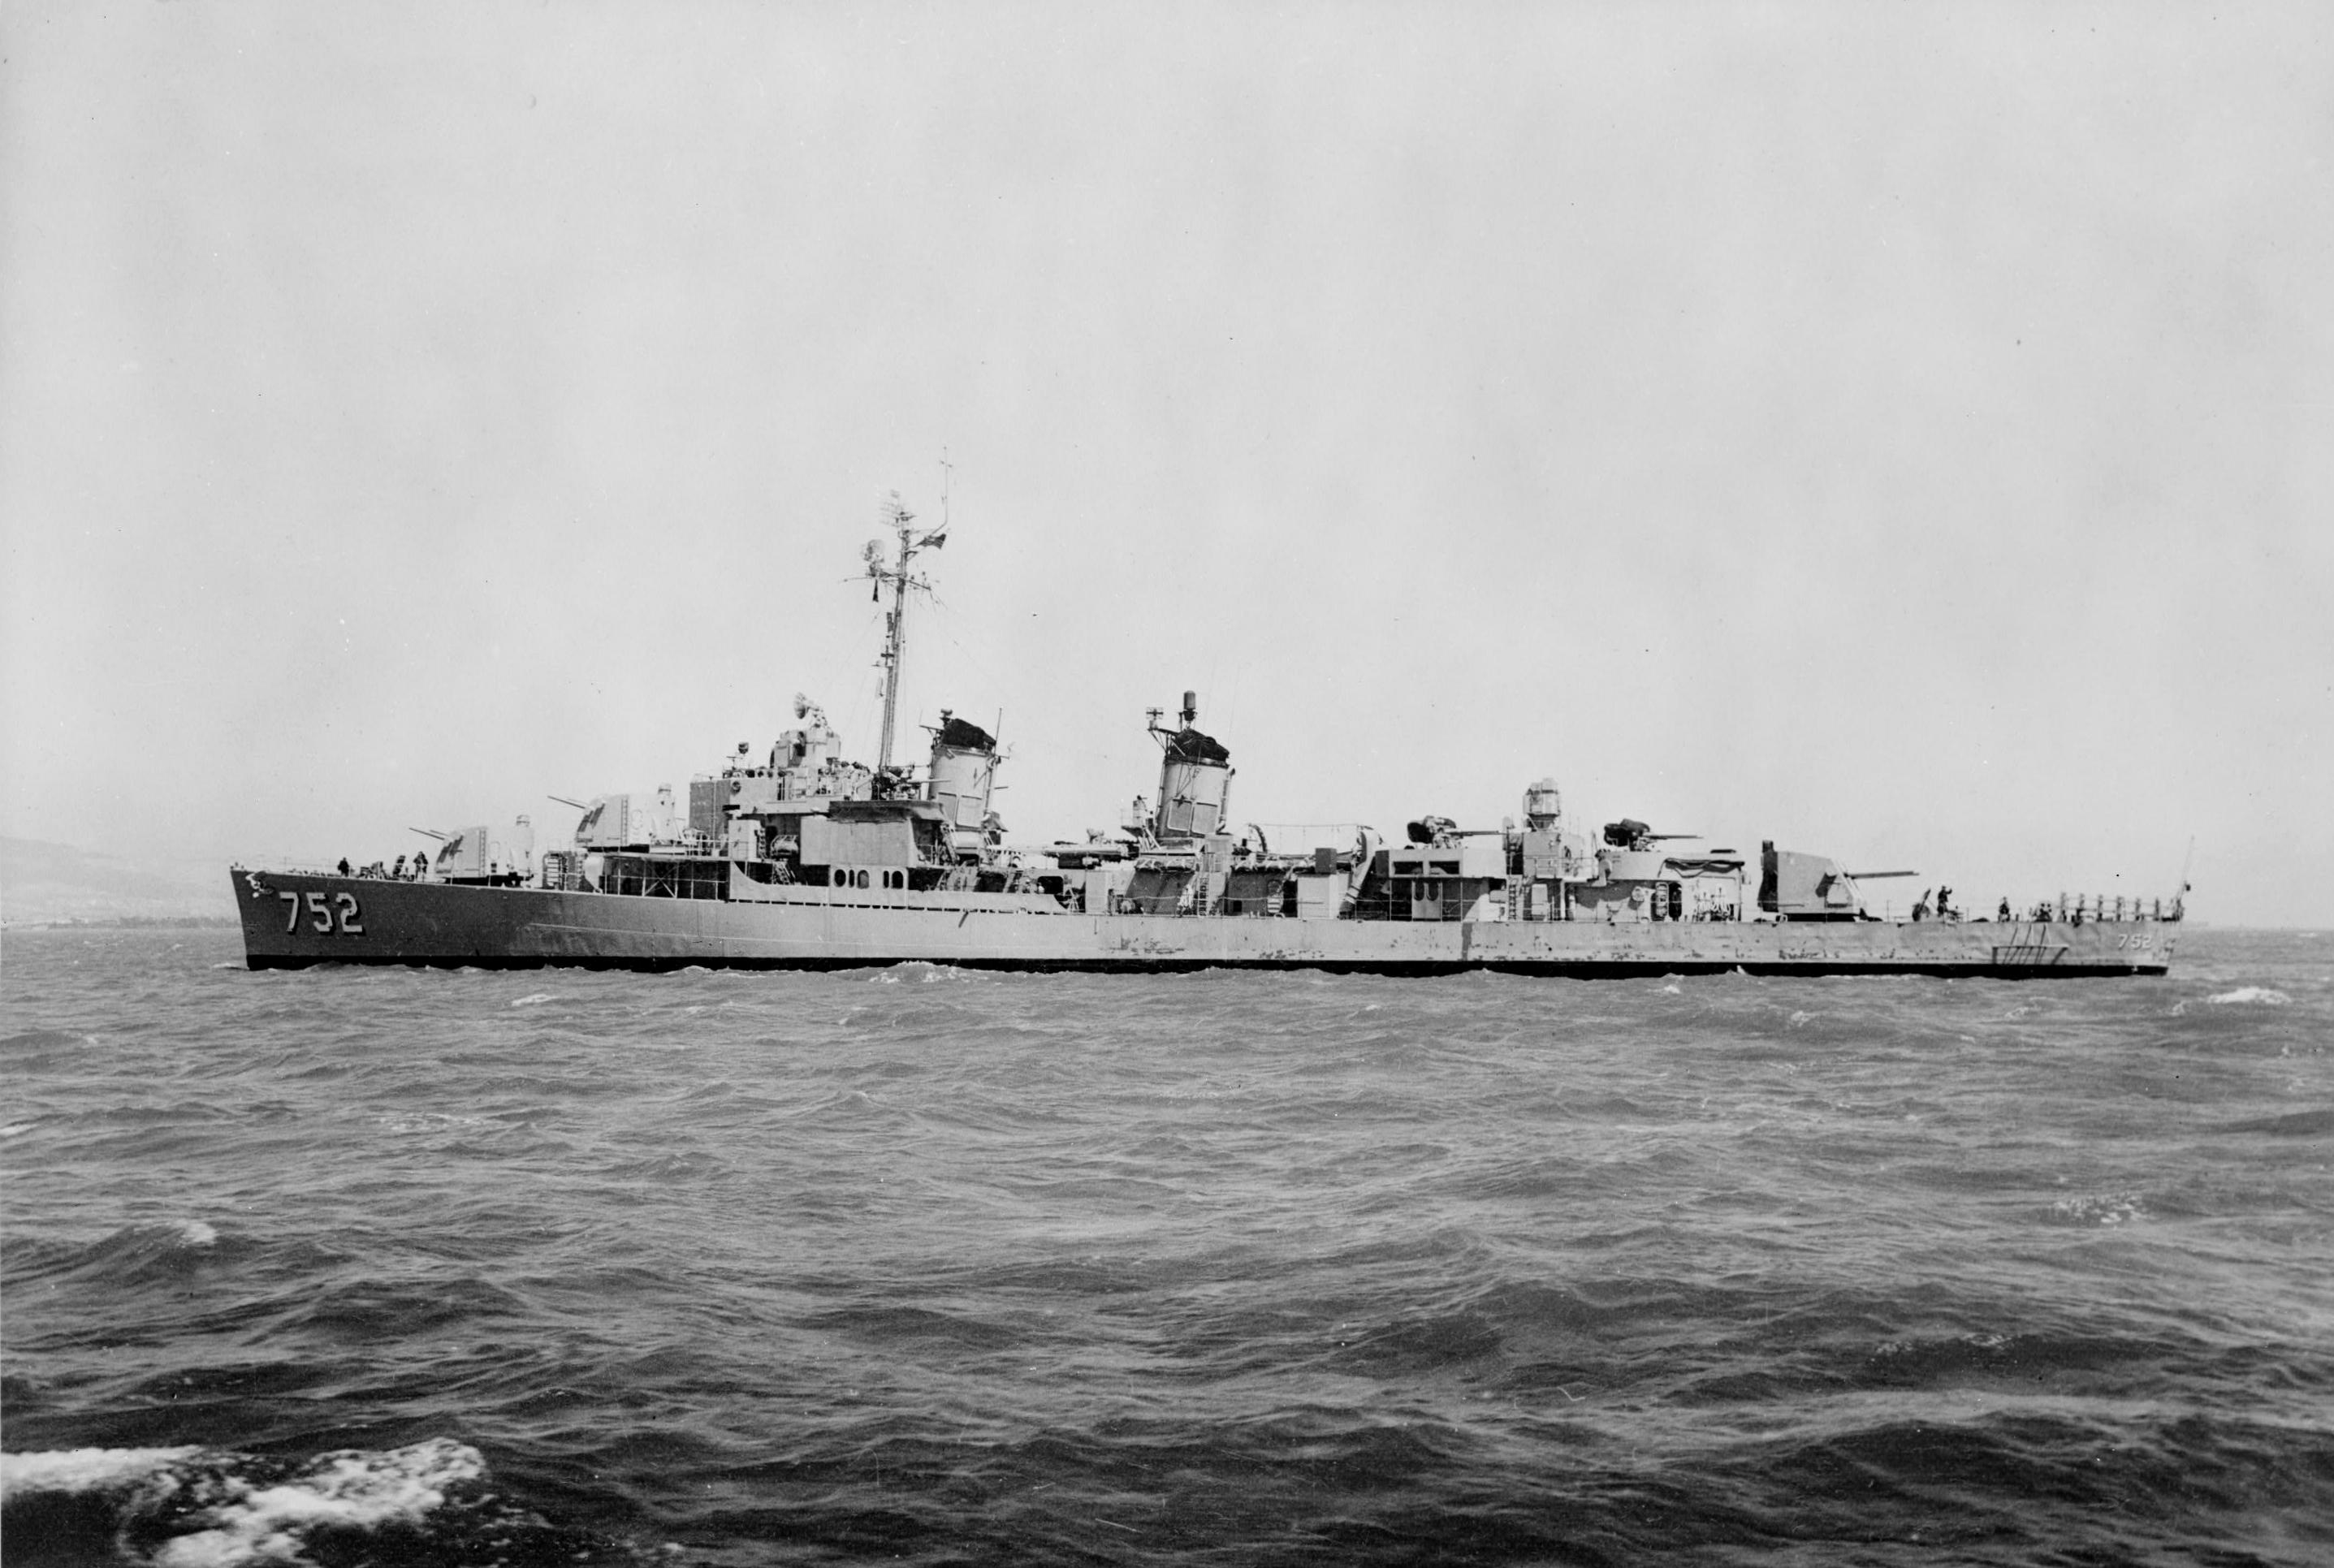 File:USS Alfred A. Cunningham (DD-752) off the San Francisco